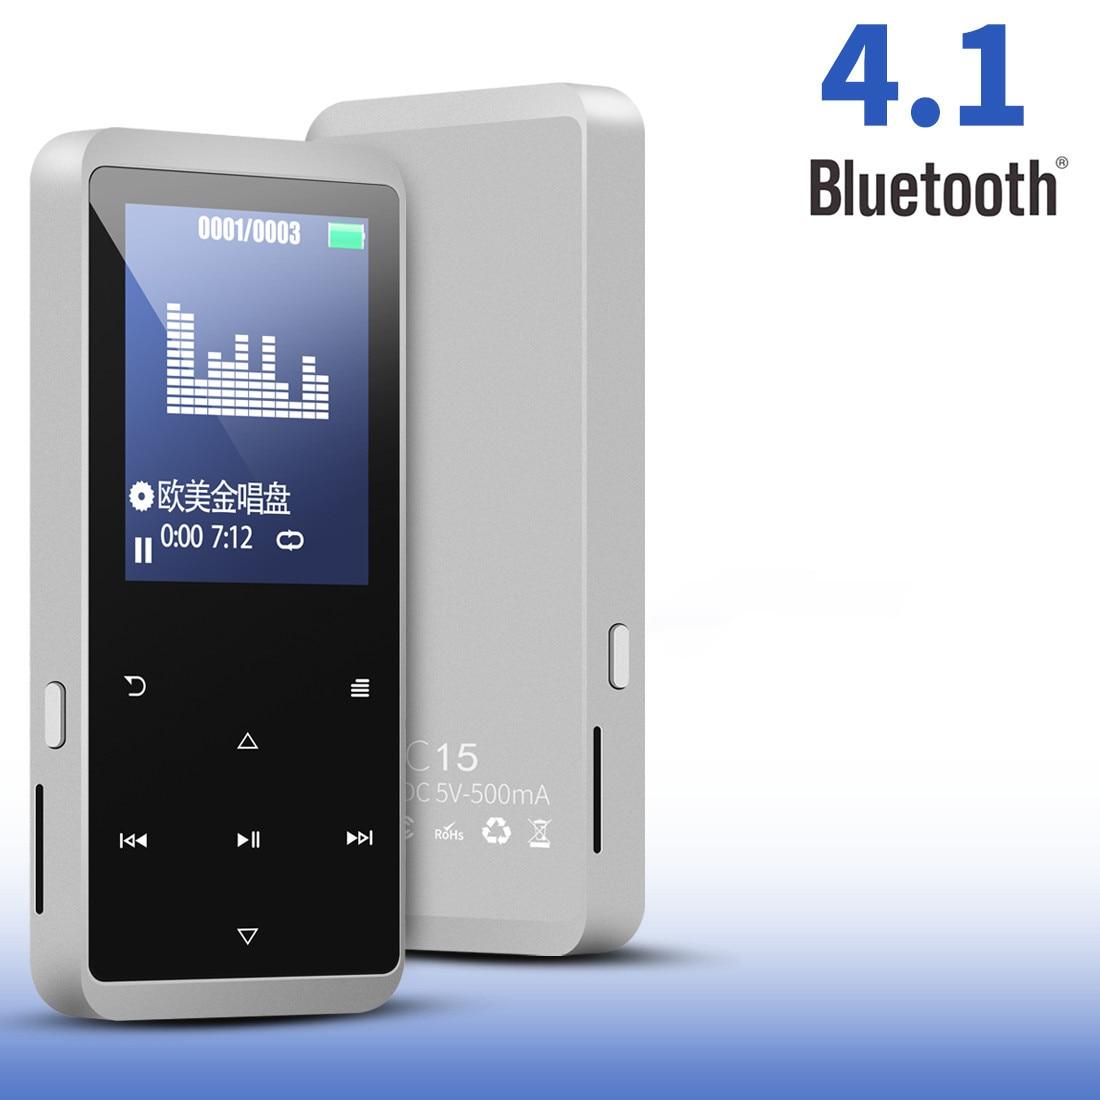 Cross Border for Bluetooth MP3 Walkman Portable Card Instert Non Destructive Music Touch MP4 Music Player Voice Recorder